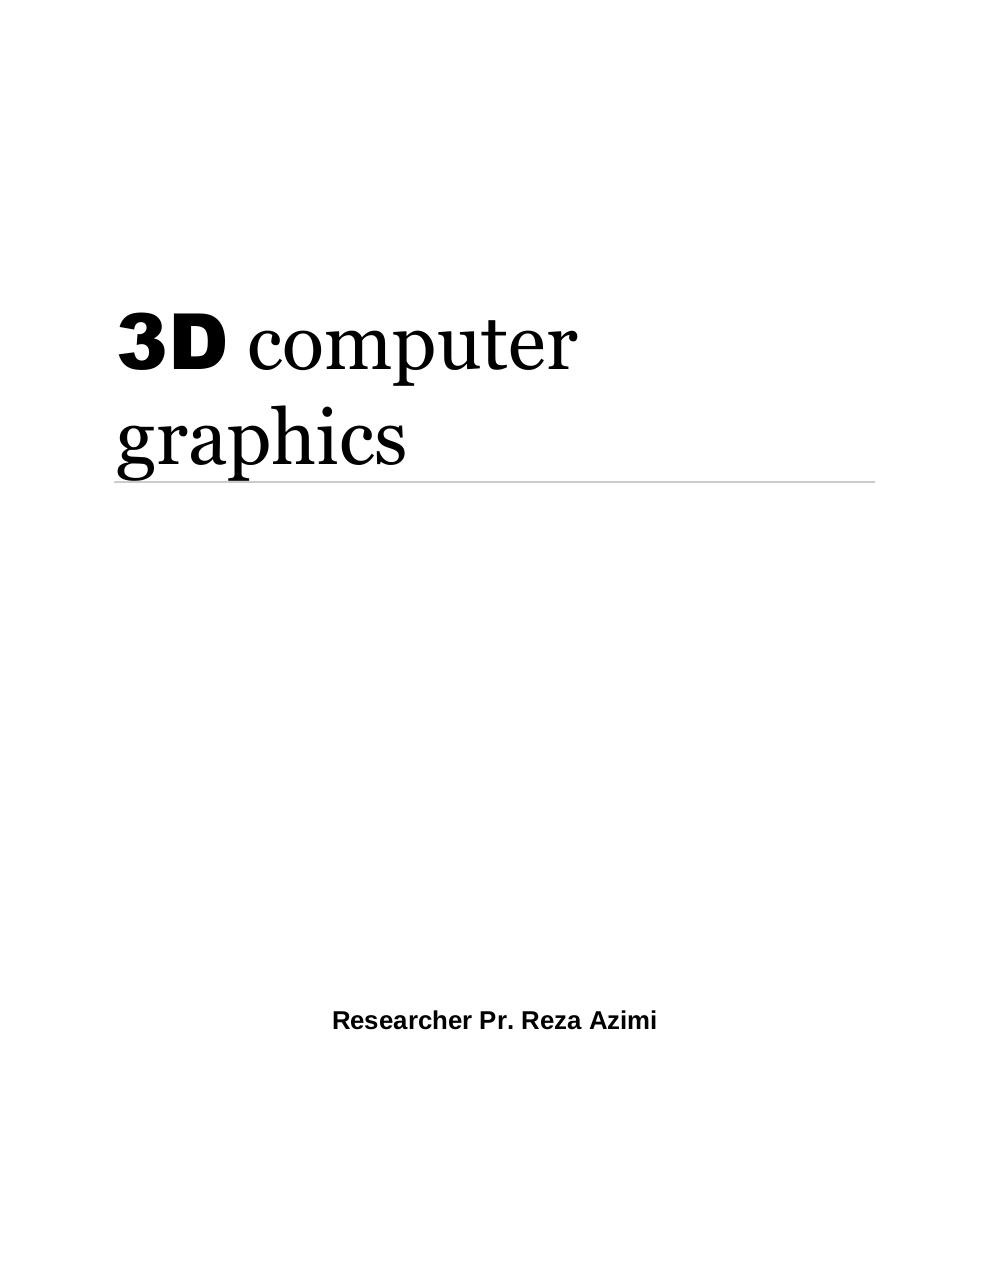 3ds max tutorial pdf download